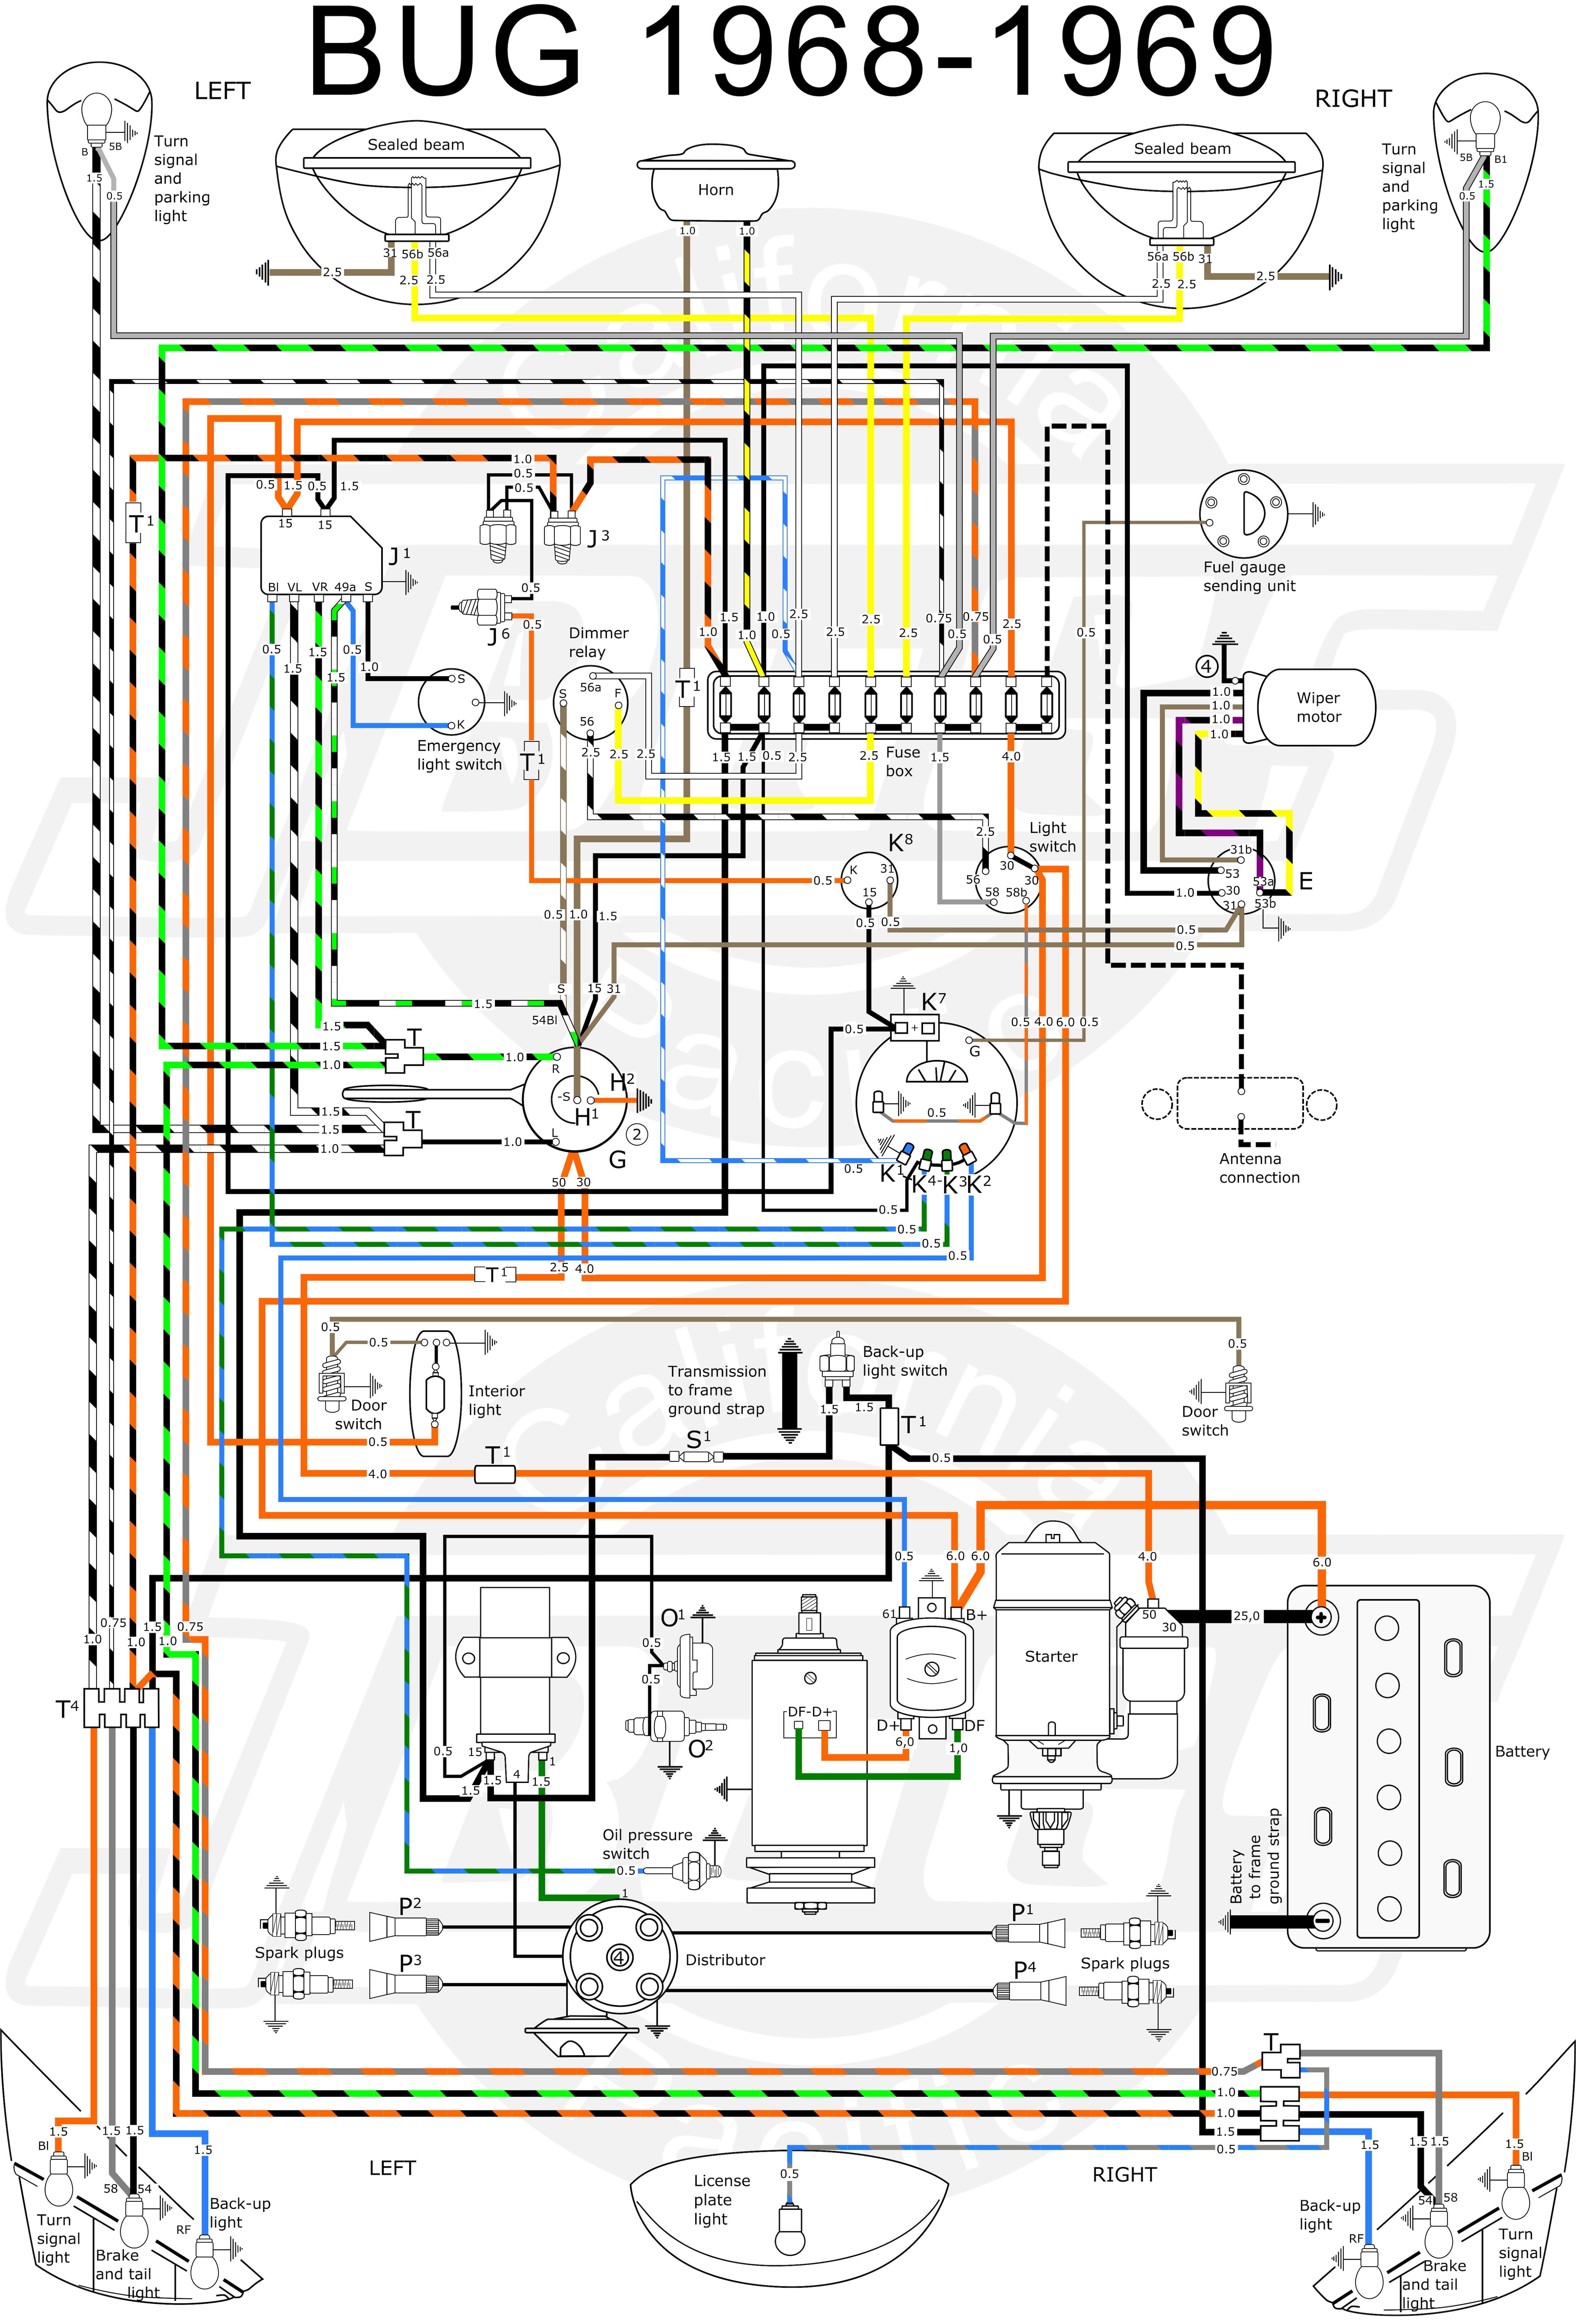 2000 Vw Beetle Engine Diagram 1600cc Beetle Engine Diagram Starter Of 2000 Vw Beetle Engine Diagram